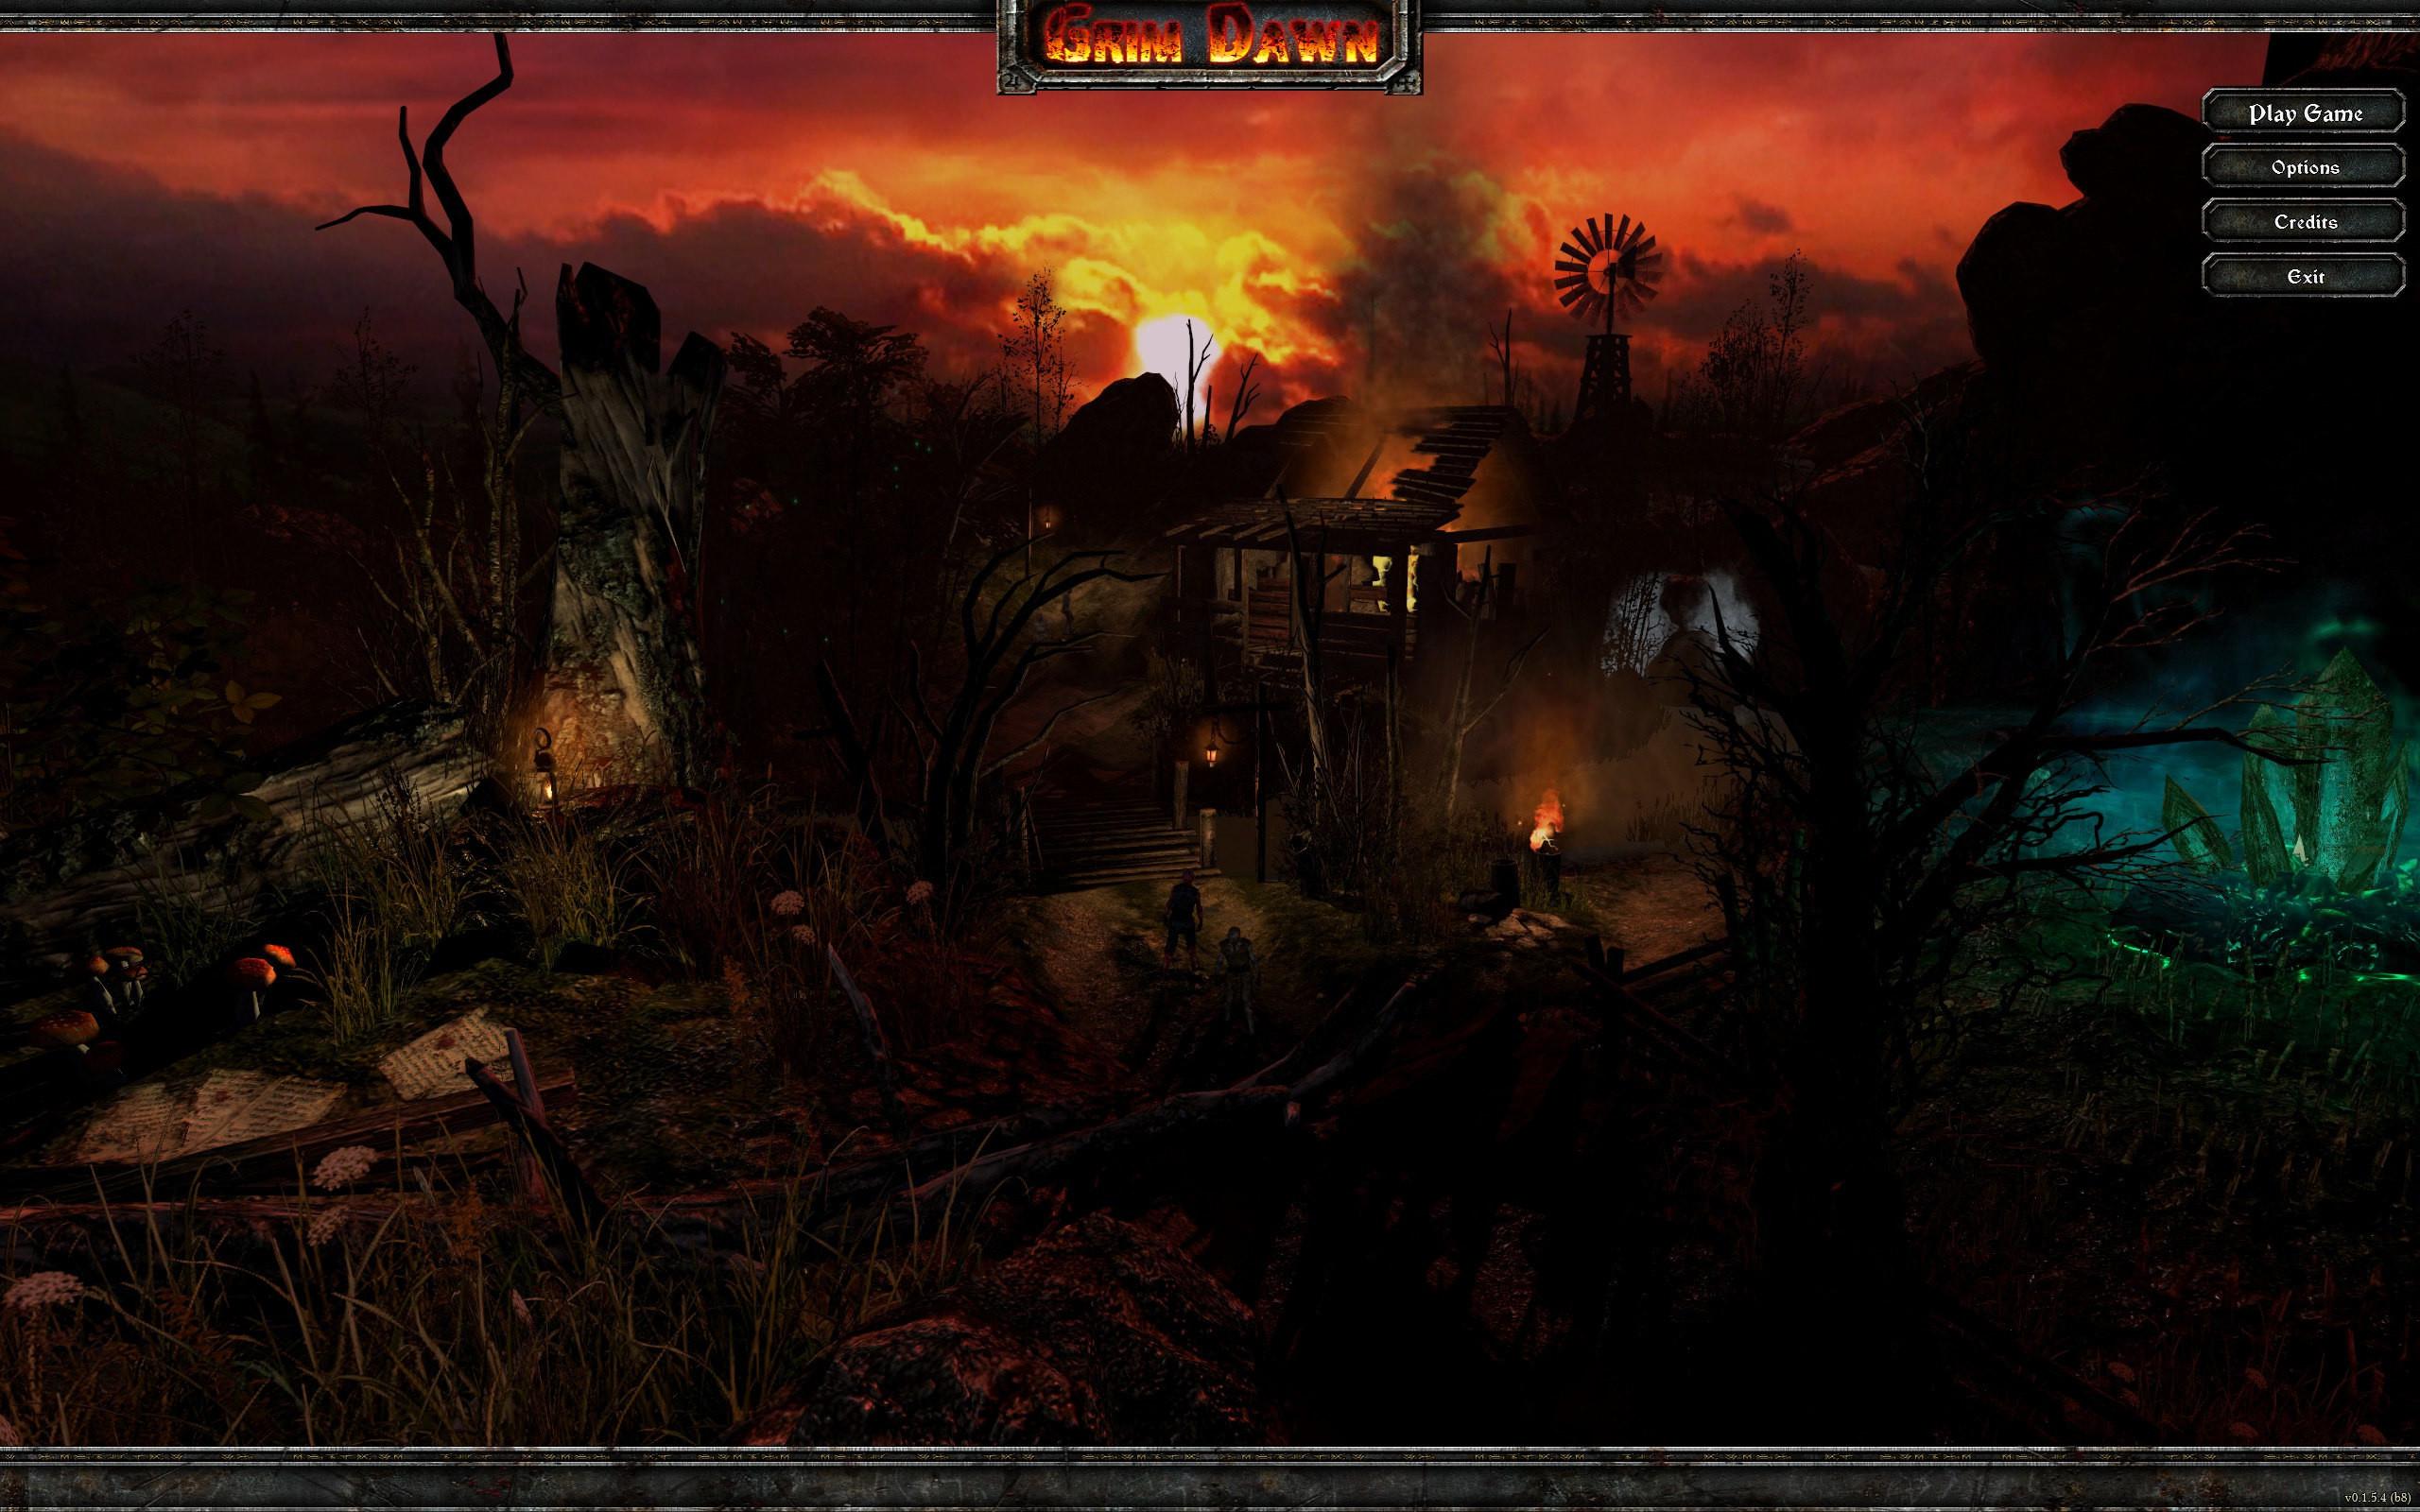 Grim Dawn main menu